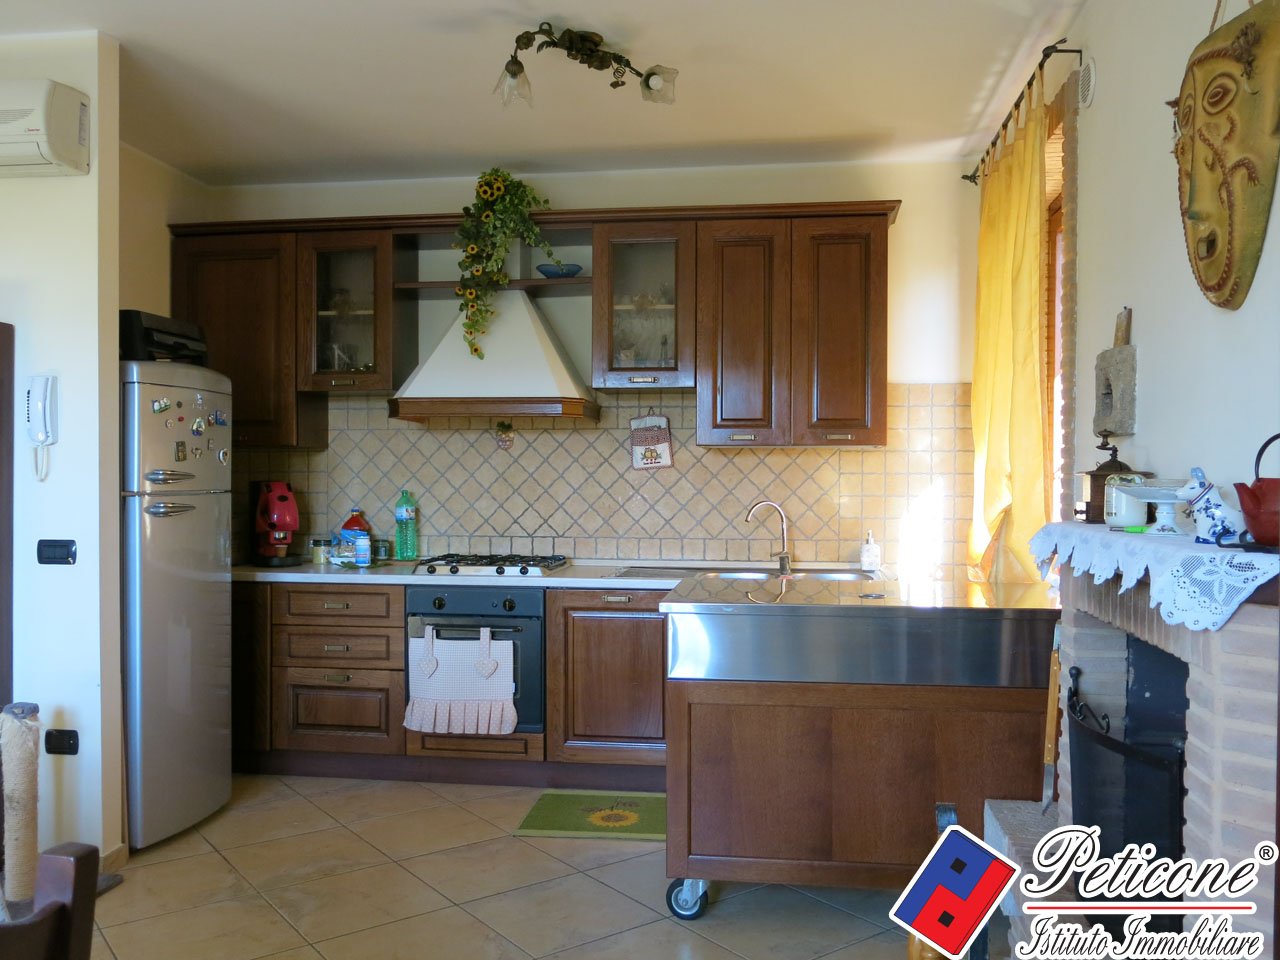 Villa in Vendita a Fondi: 3 locali, 107 mq - Foto 7